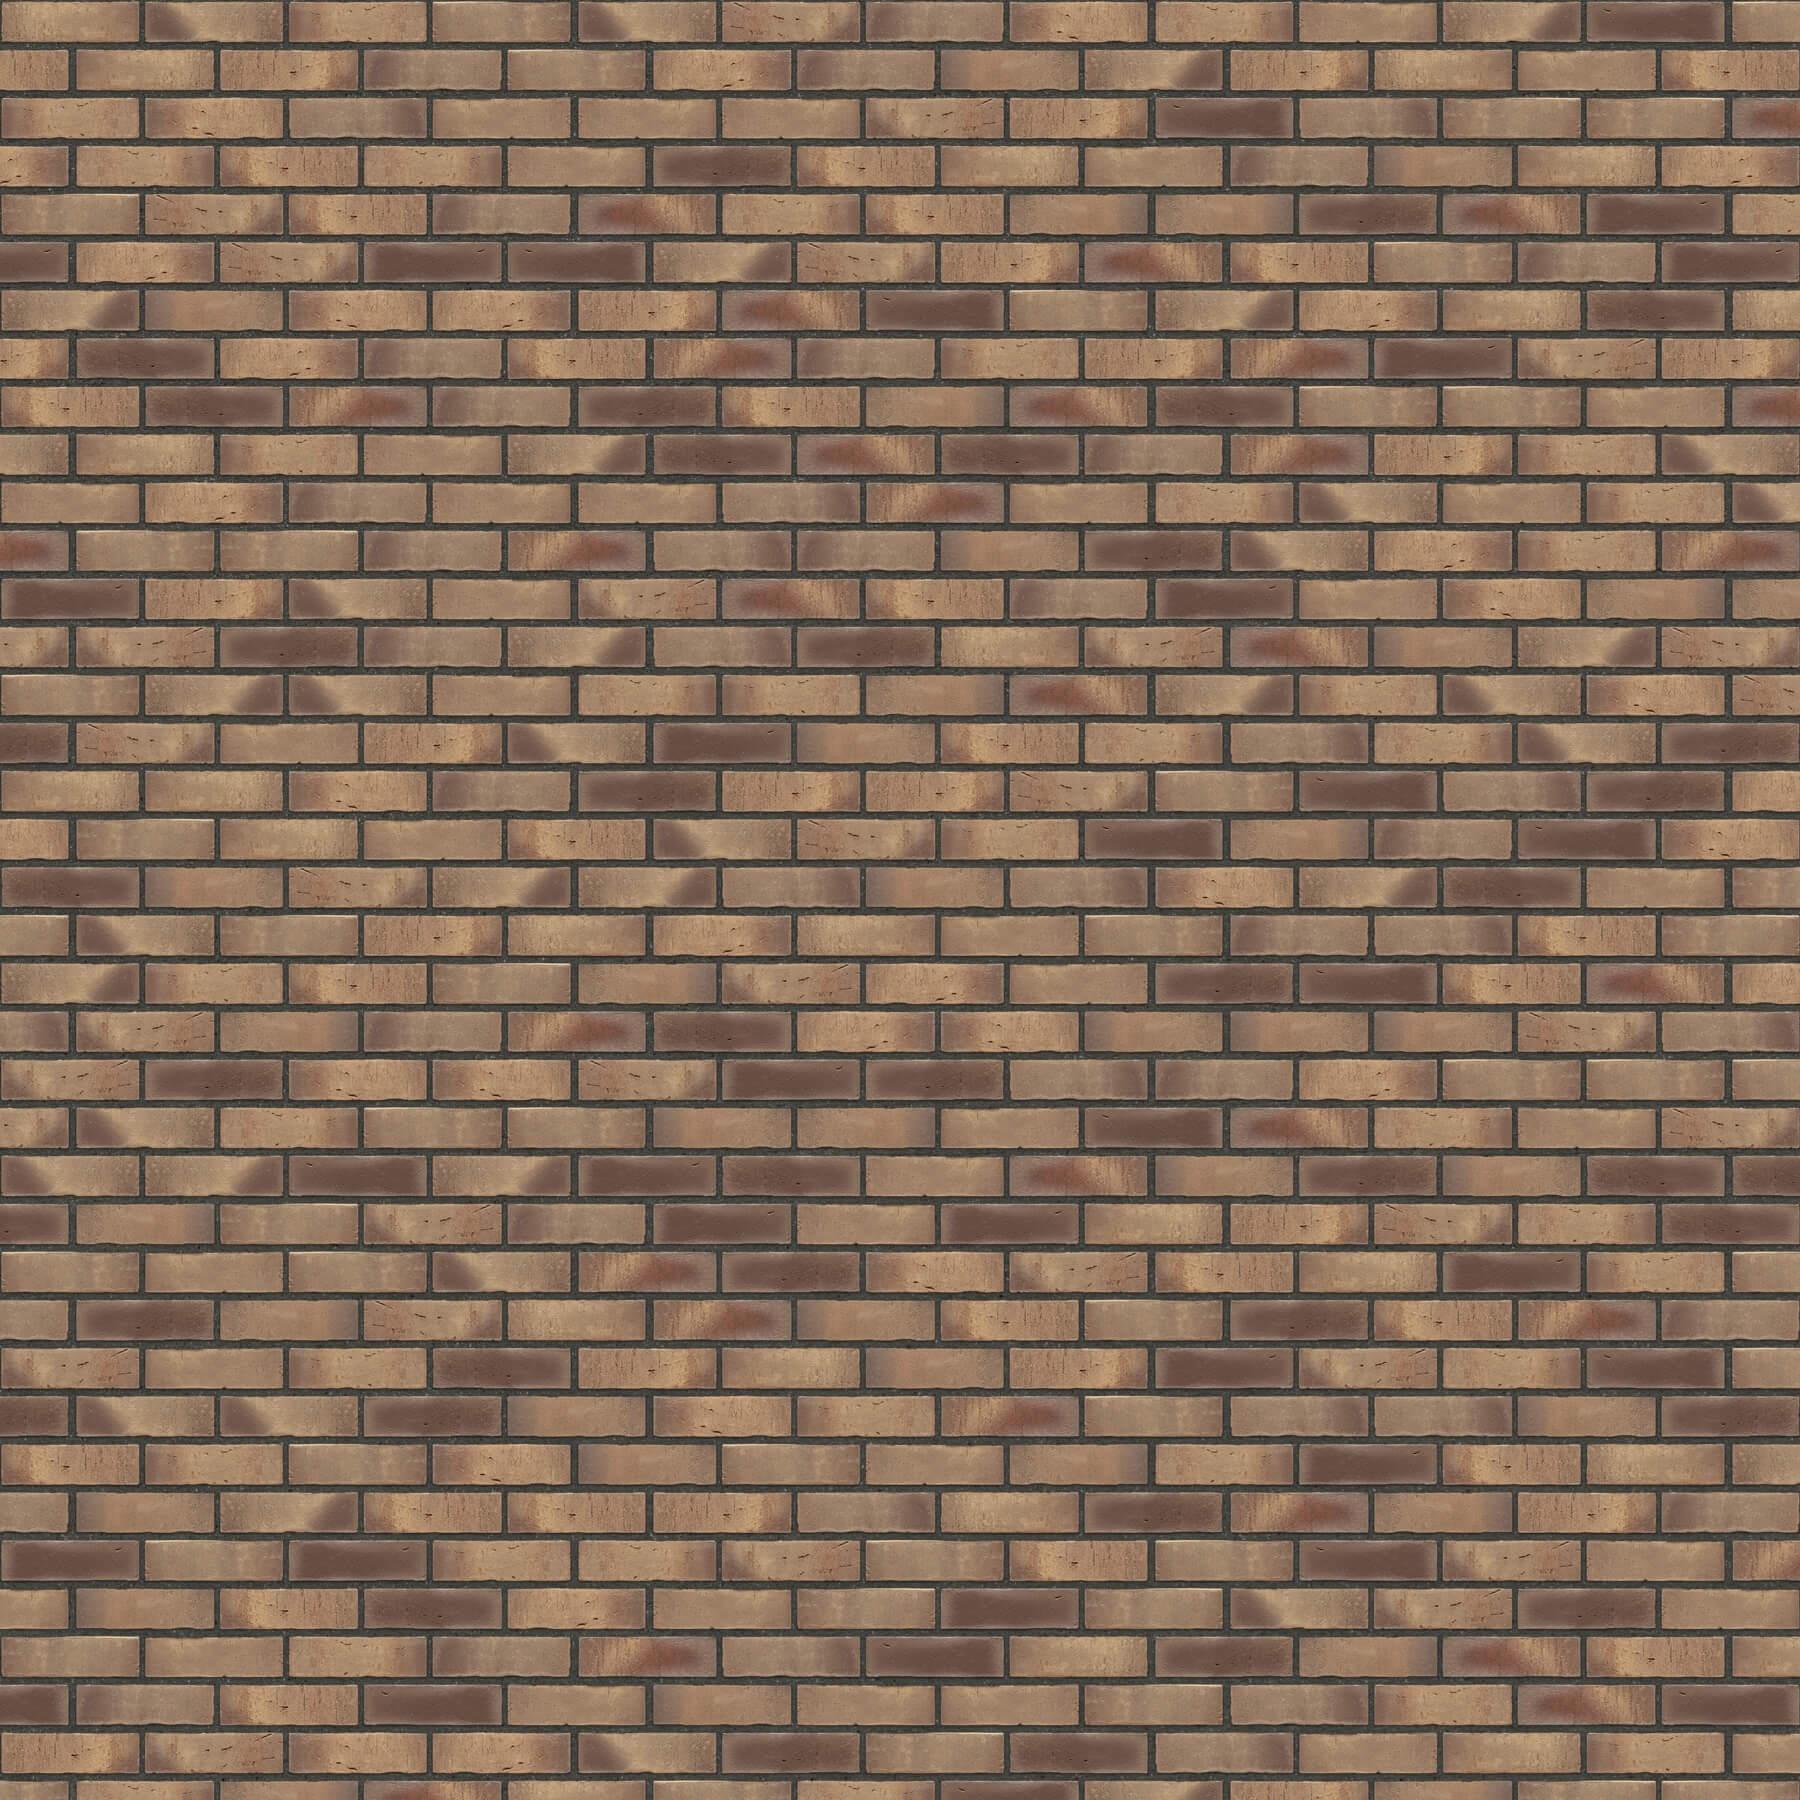 Dekorativna cigla listela FeldHaus Klinker r-931 nf Antracit Fuga